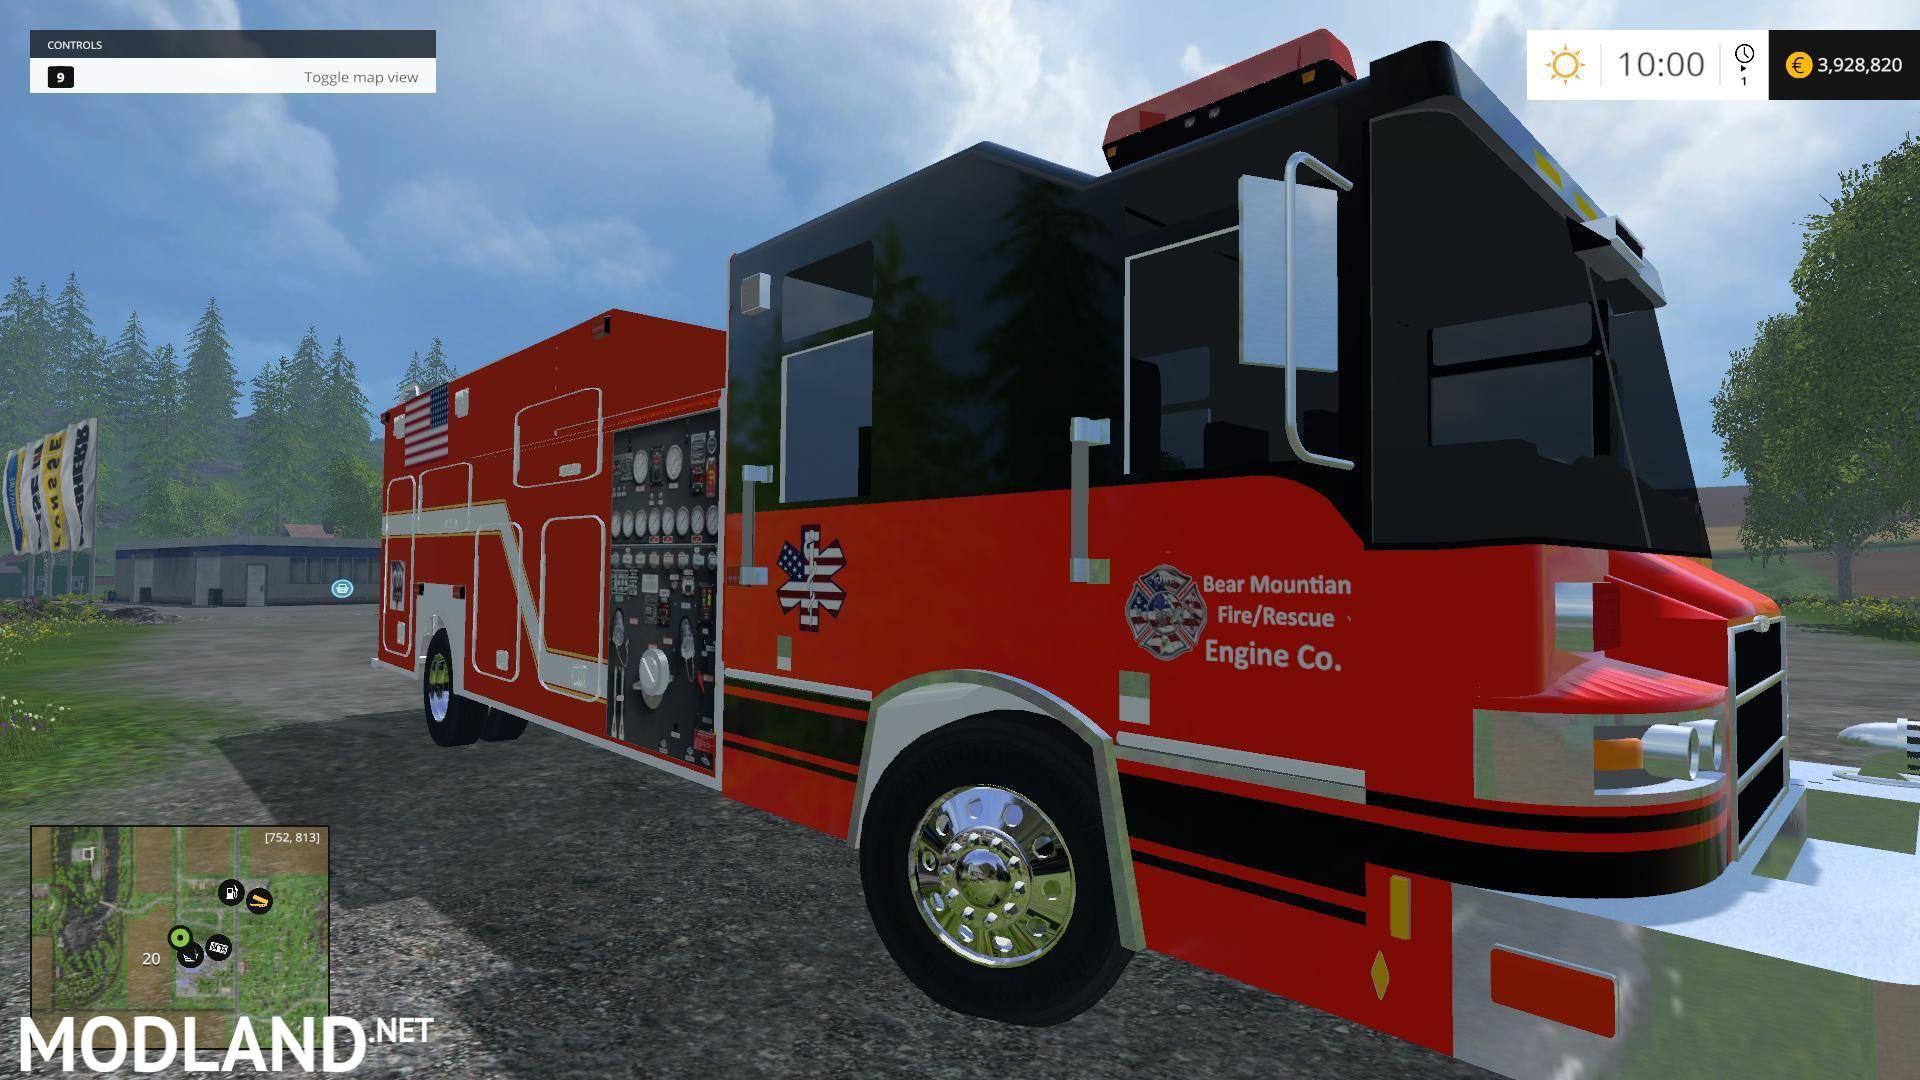 U S Fire Truck v 1 0 mod for Farming Simulator 2015 / 15